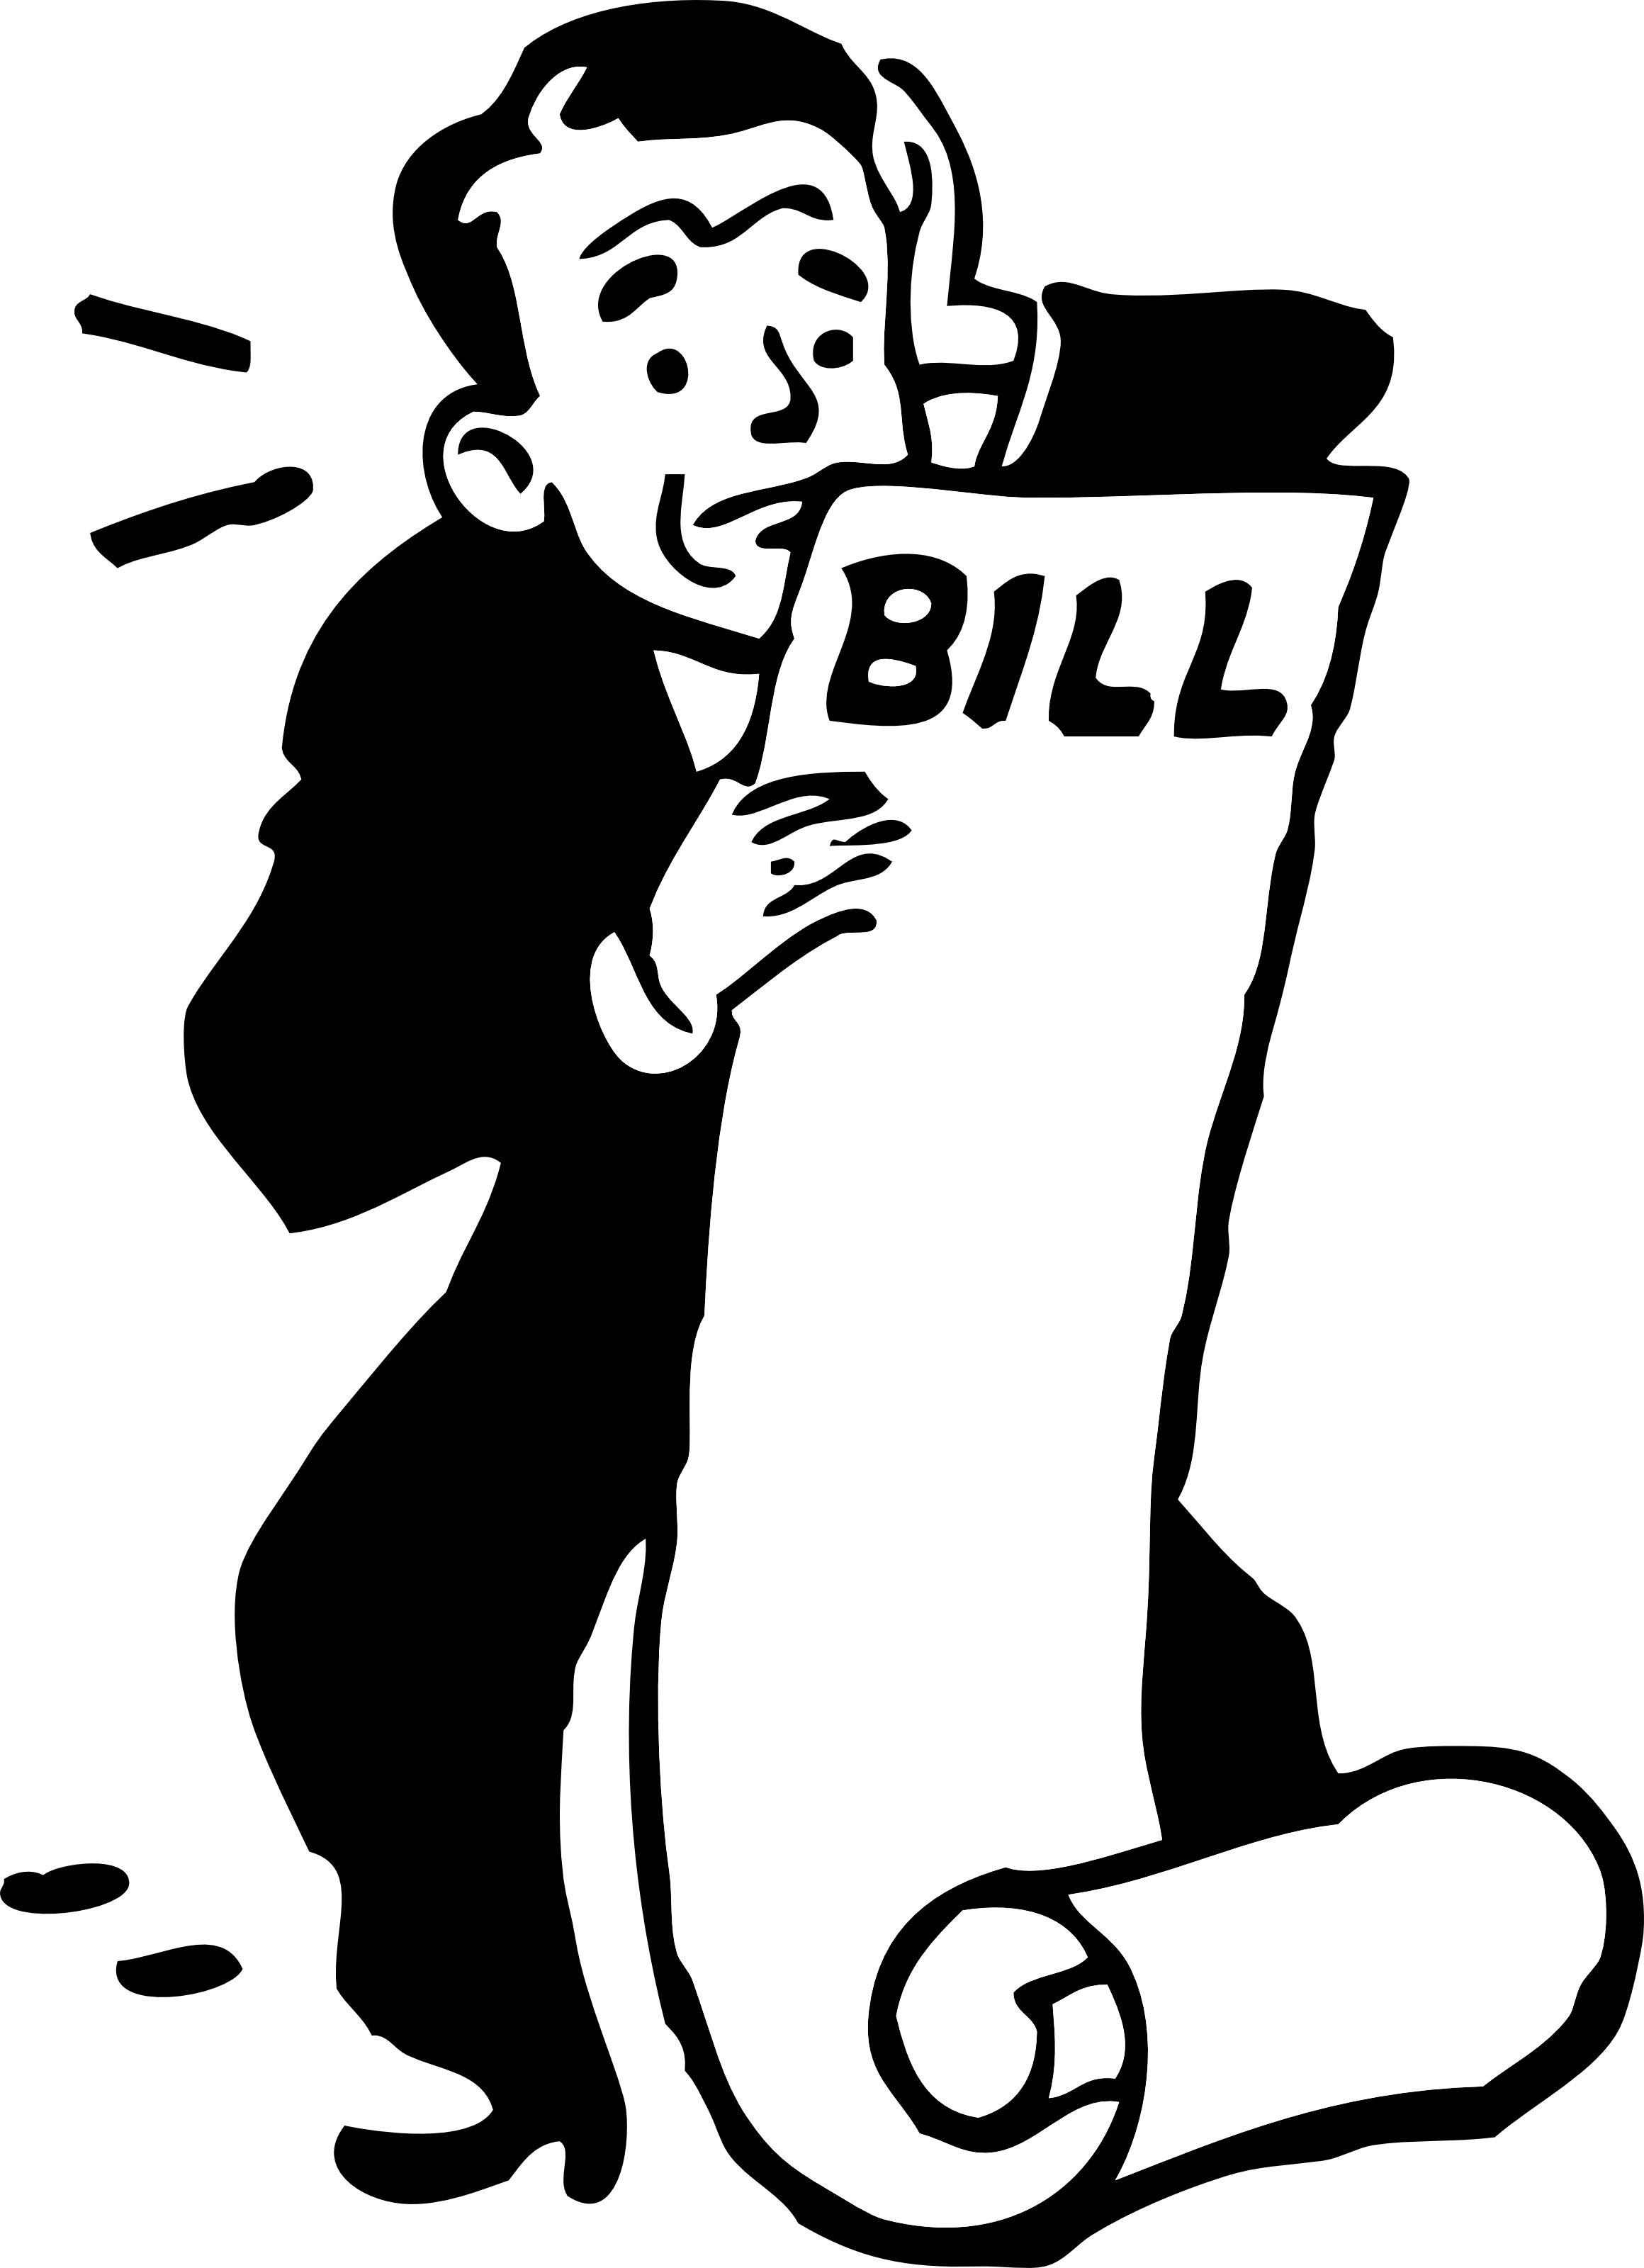 Clip art statement . Bill clipart animated